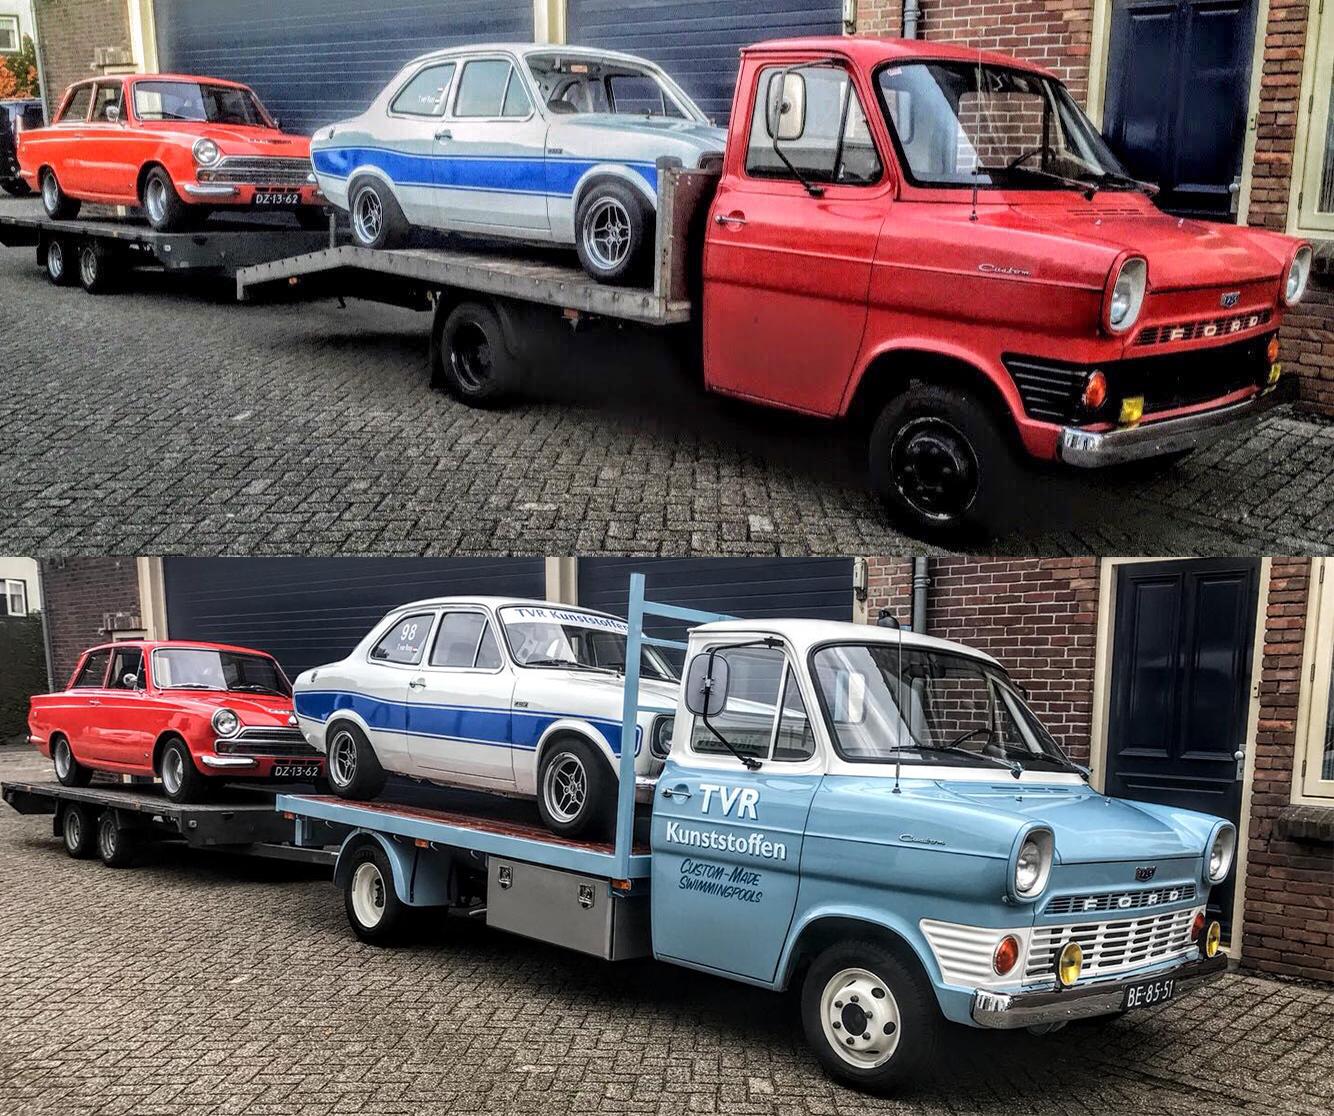 ….Ford Transit MK1, restoration, start November 2017, ready August 2018 ..Ford Transit MK1, restauratie, start november 2017, gereed augustus 2018….